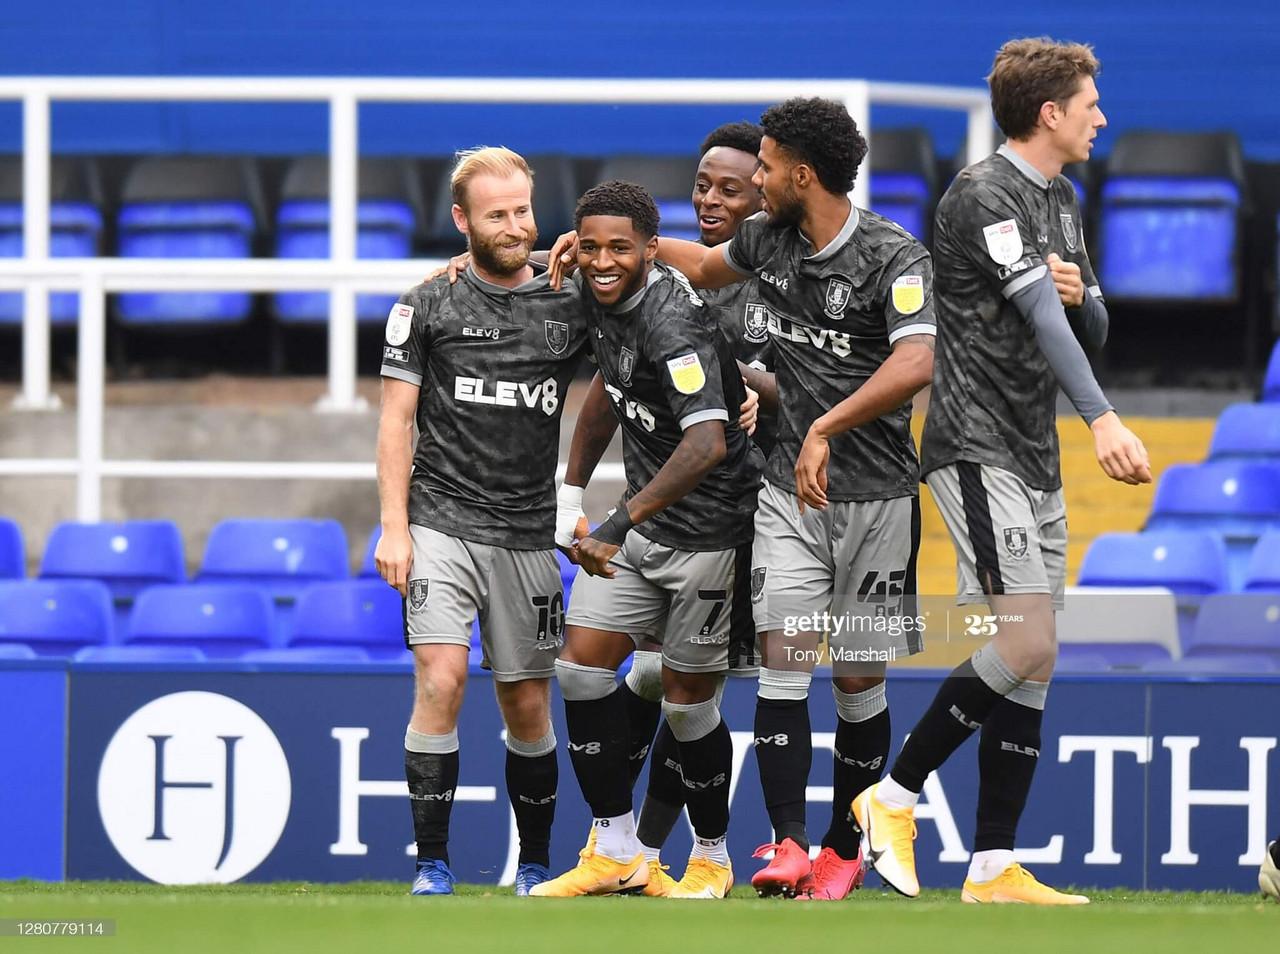 As it happened: Sheffield Wednesday 1-2 Brentford